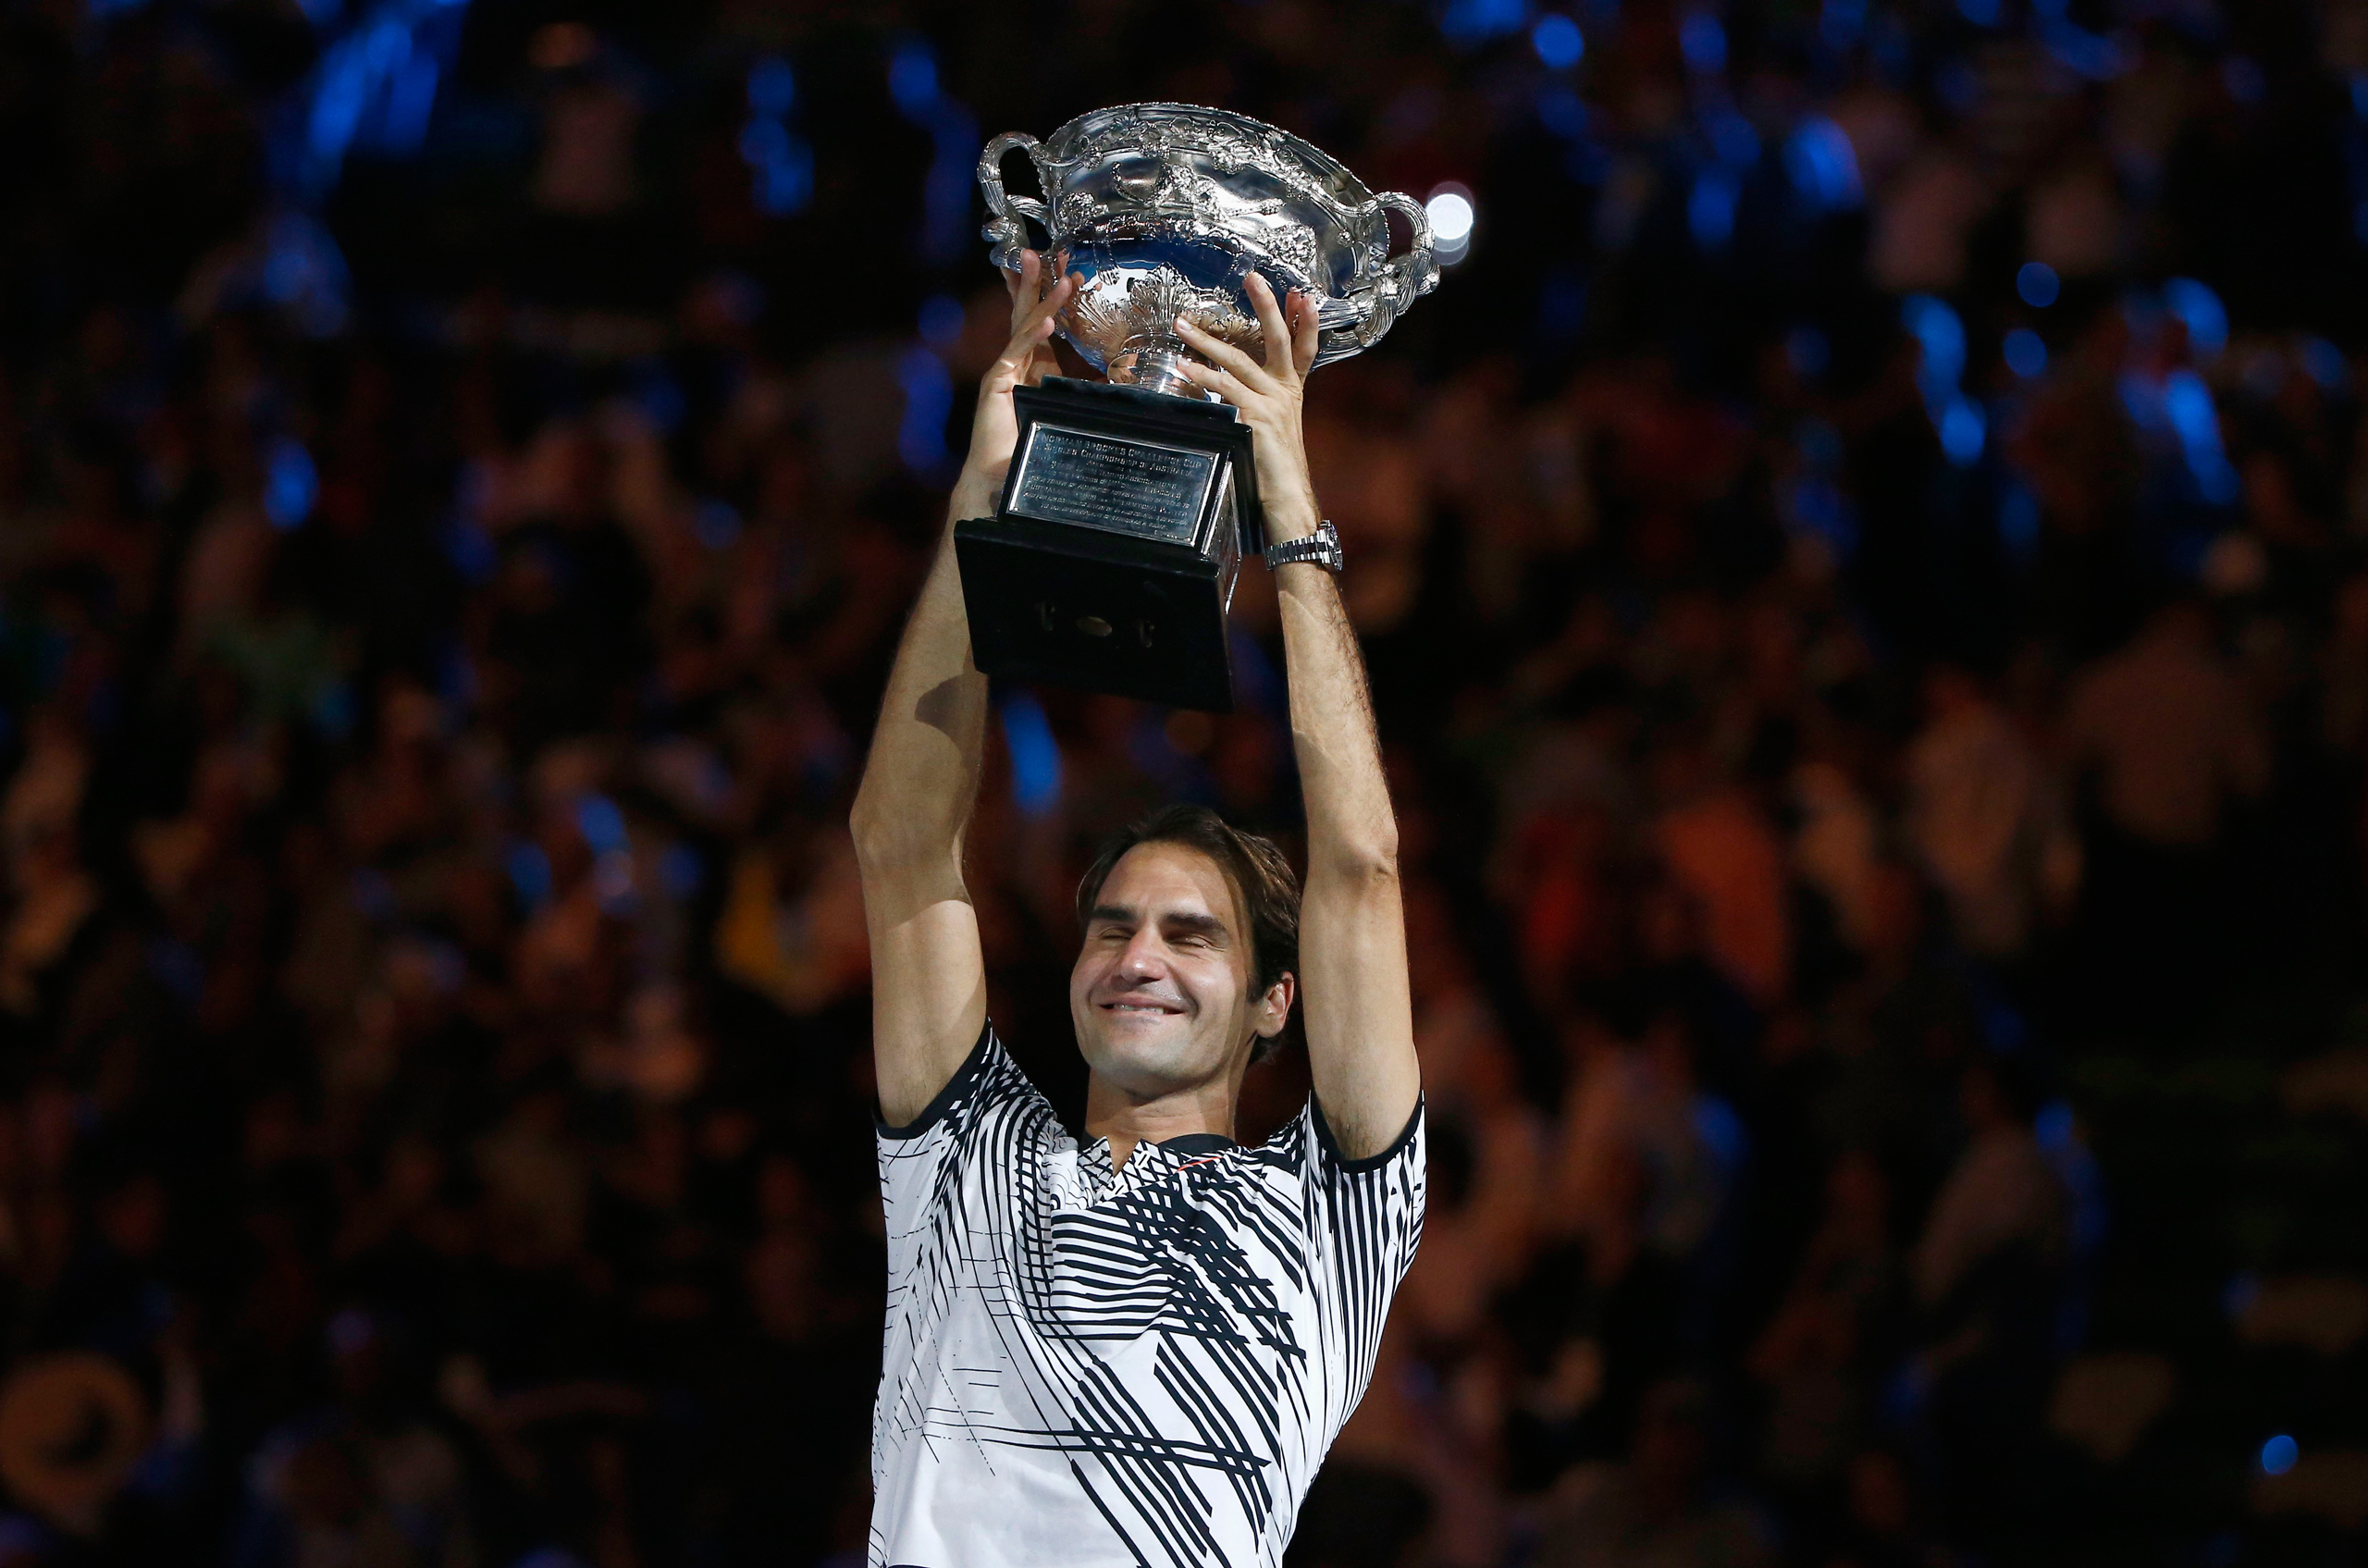 Switzerland's Roger Federer holds up the trophy after winning the Australian Open Men's singles final match against Spain's Rafael Nadal in Melbourne on Jan. 29, 2017.